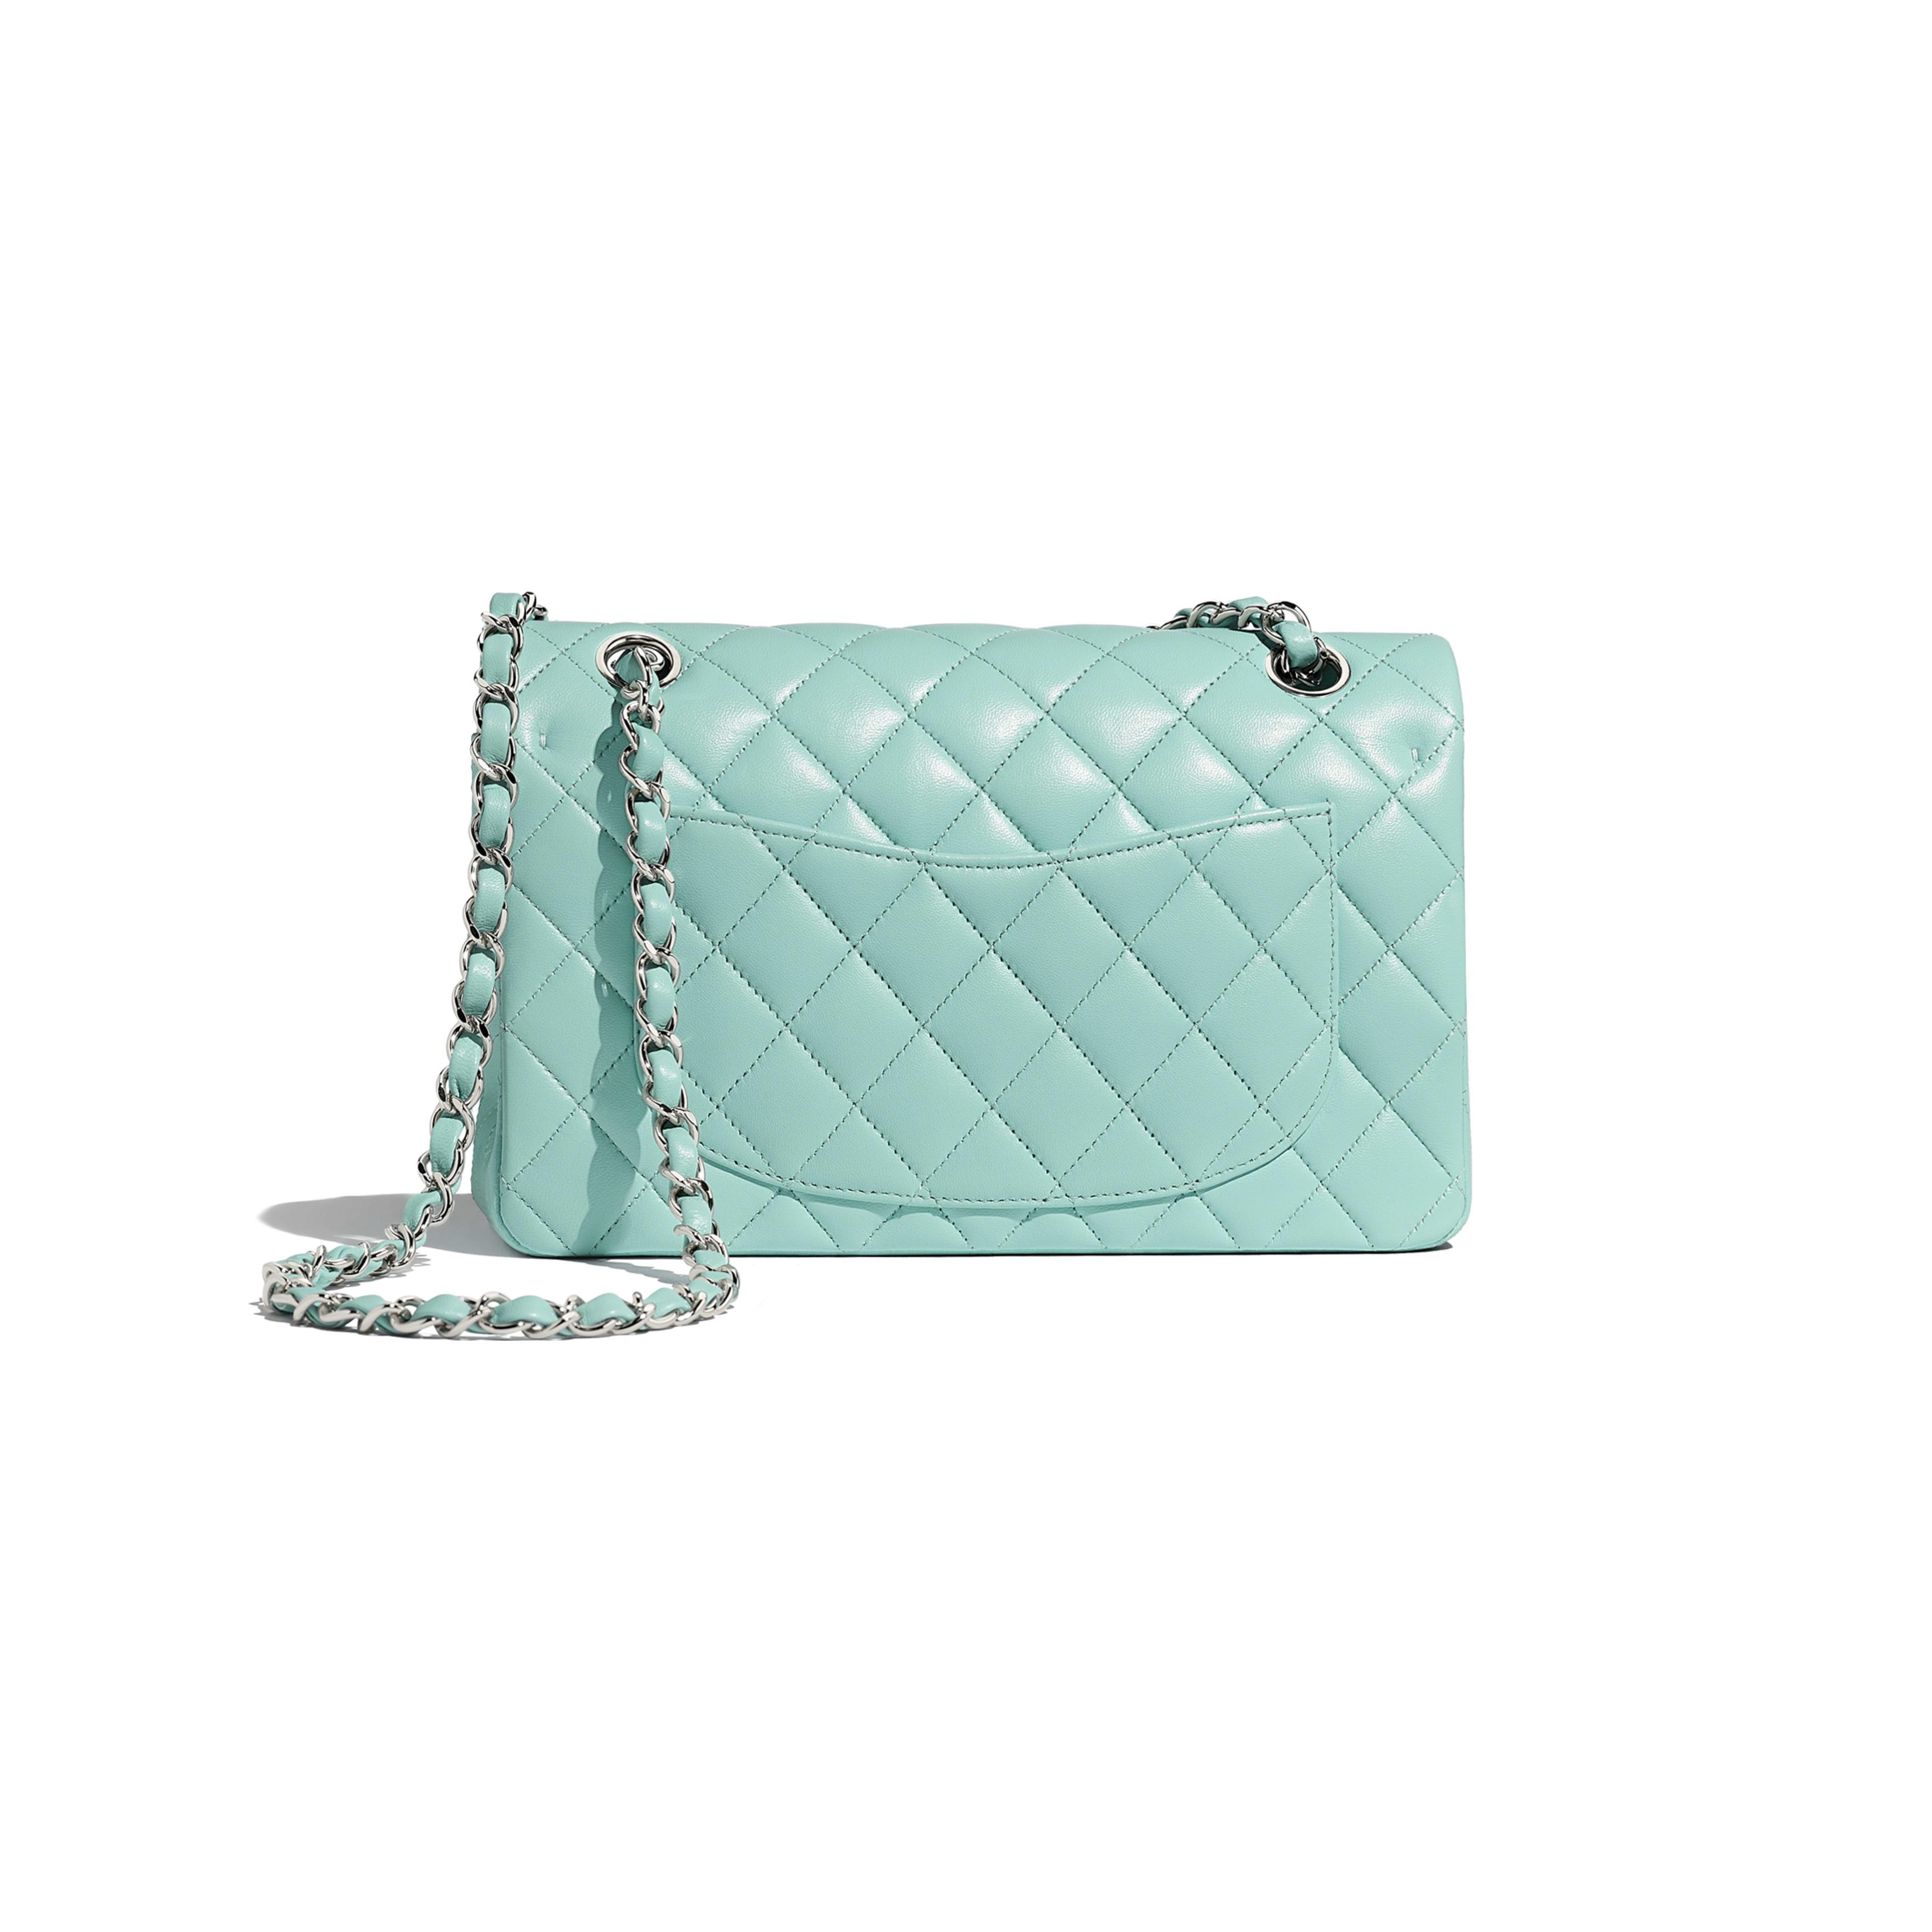 Small Classic Handbag - Light Blue - Lambskin & Silver-Tone Metal - Alternative view - see full sized version